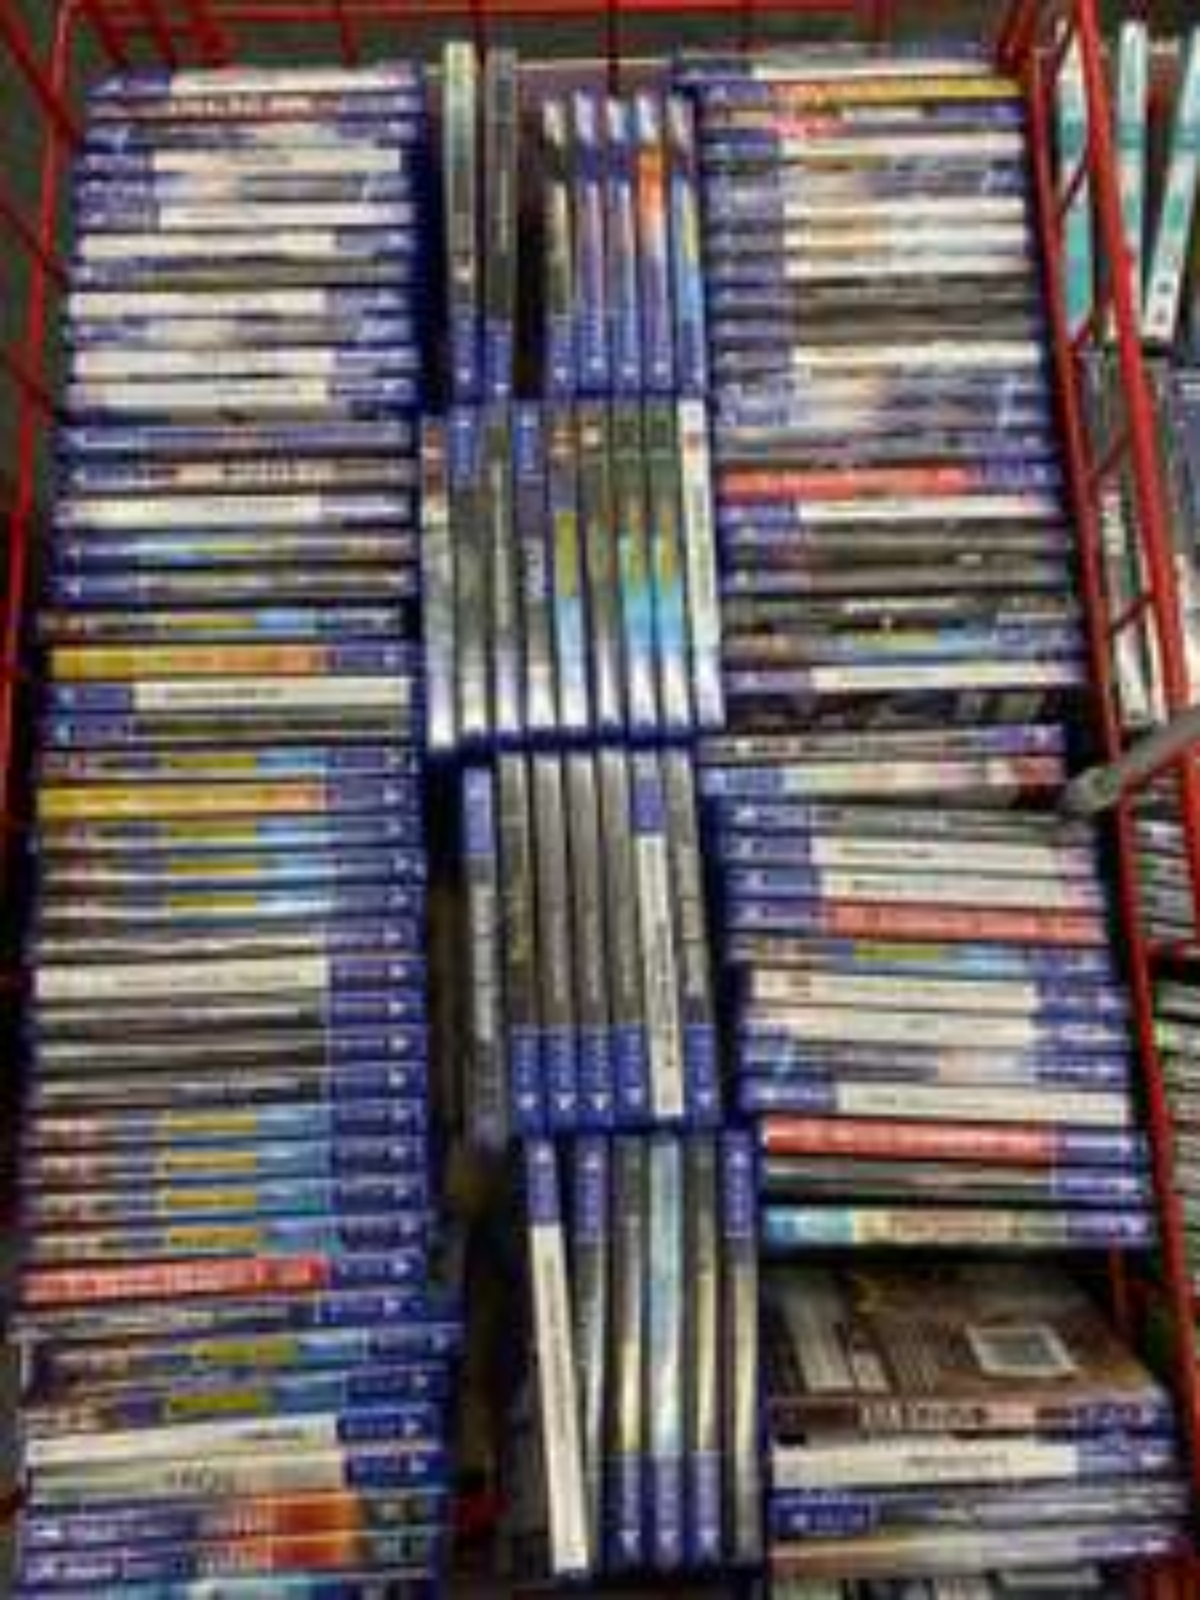 [Lokal Media Markt Berlin Spandau] PS4, Switch, Xbox Spiele Grabbelkiste aufgefüllt